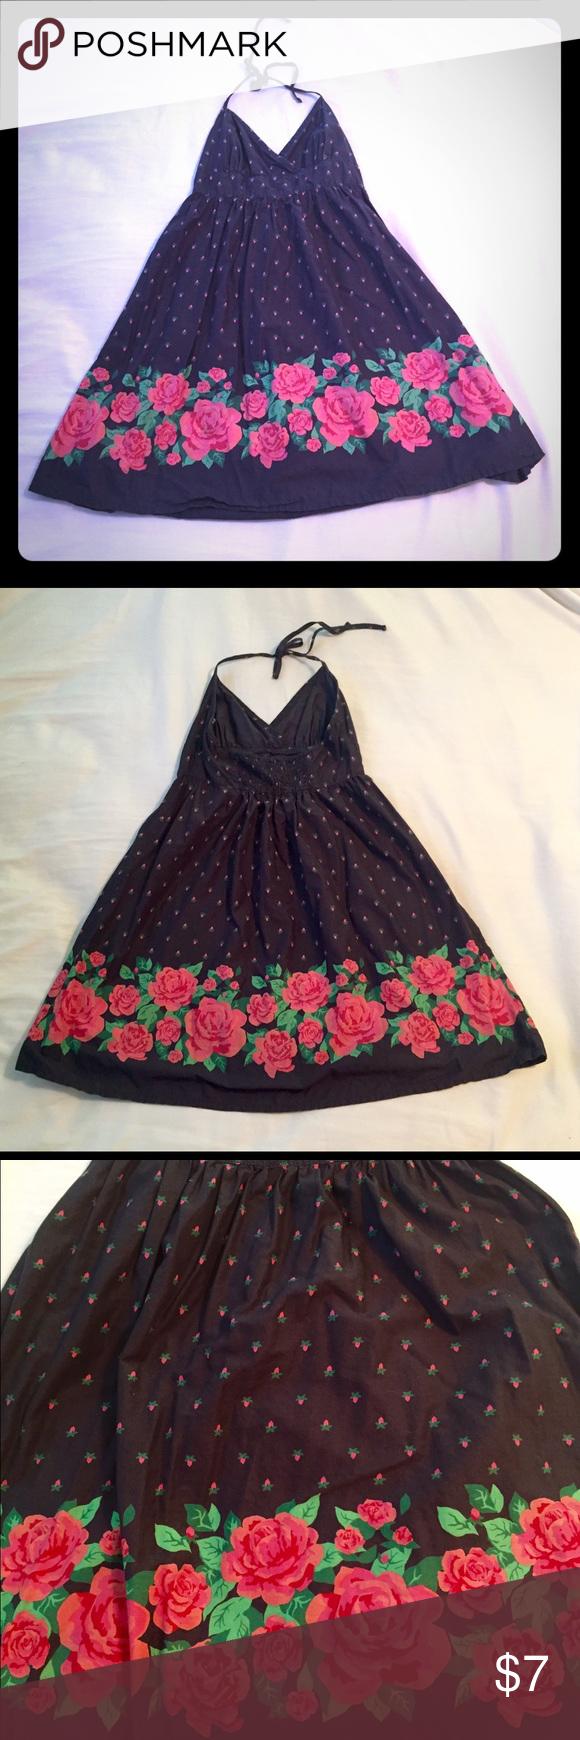 H&M Halterneck Dress - Size 4 Halterneck dress with pink floral pattern. Measures around 32 in. Lightweight and great for Summertime! H&M Dresses